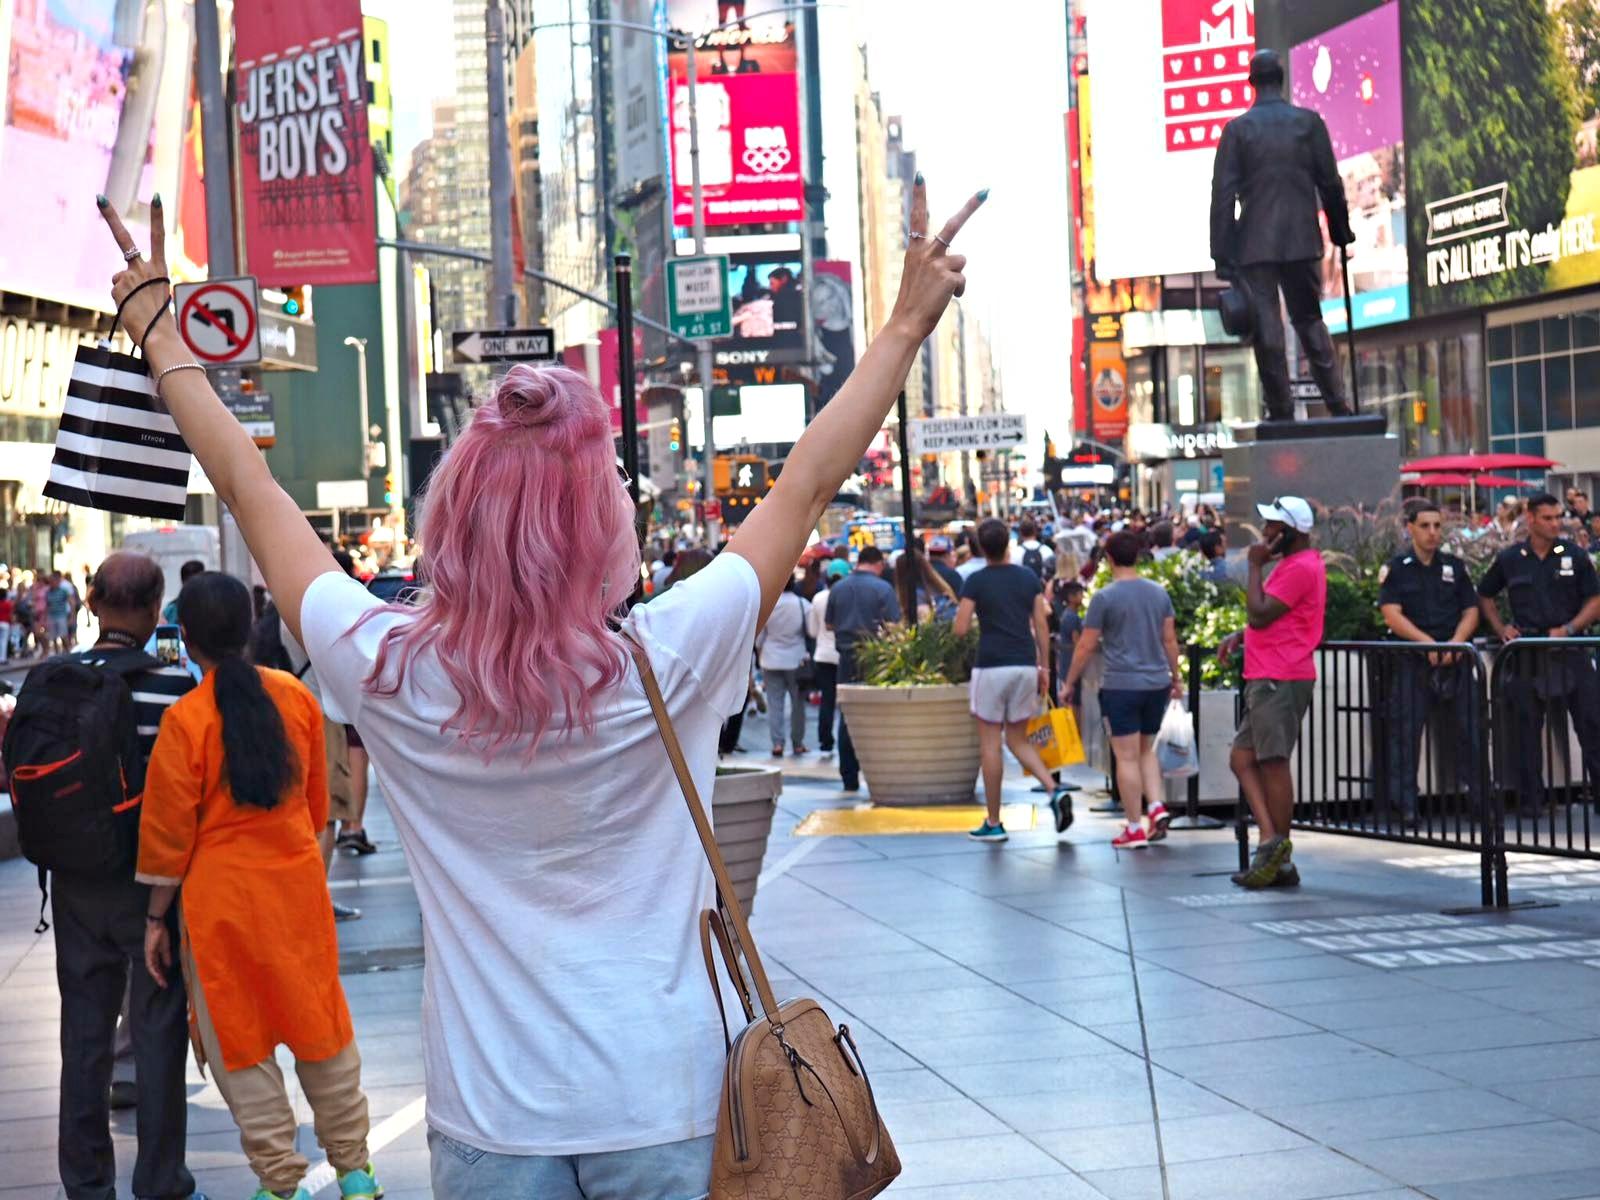 Times Square, New York, blogger trip